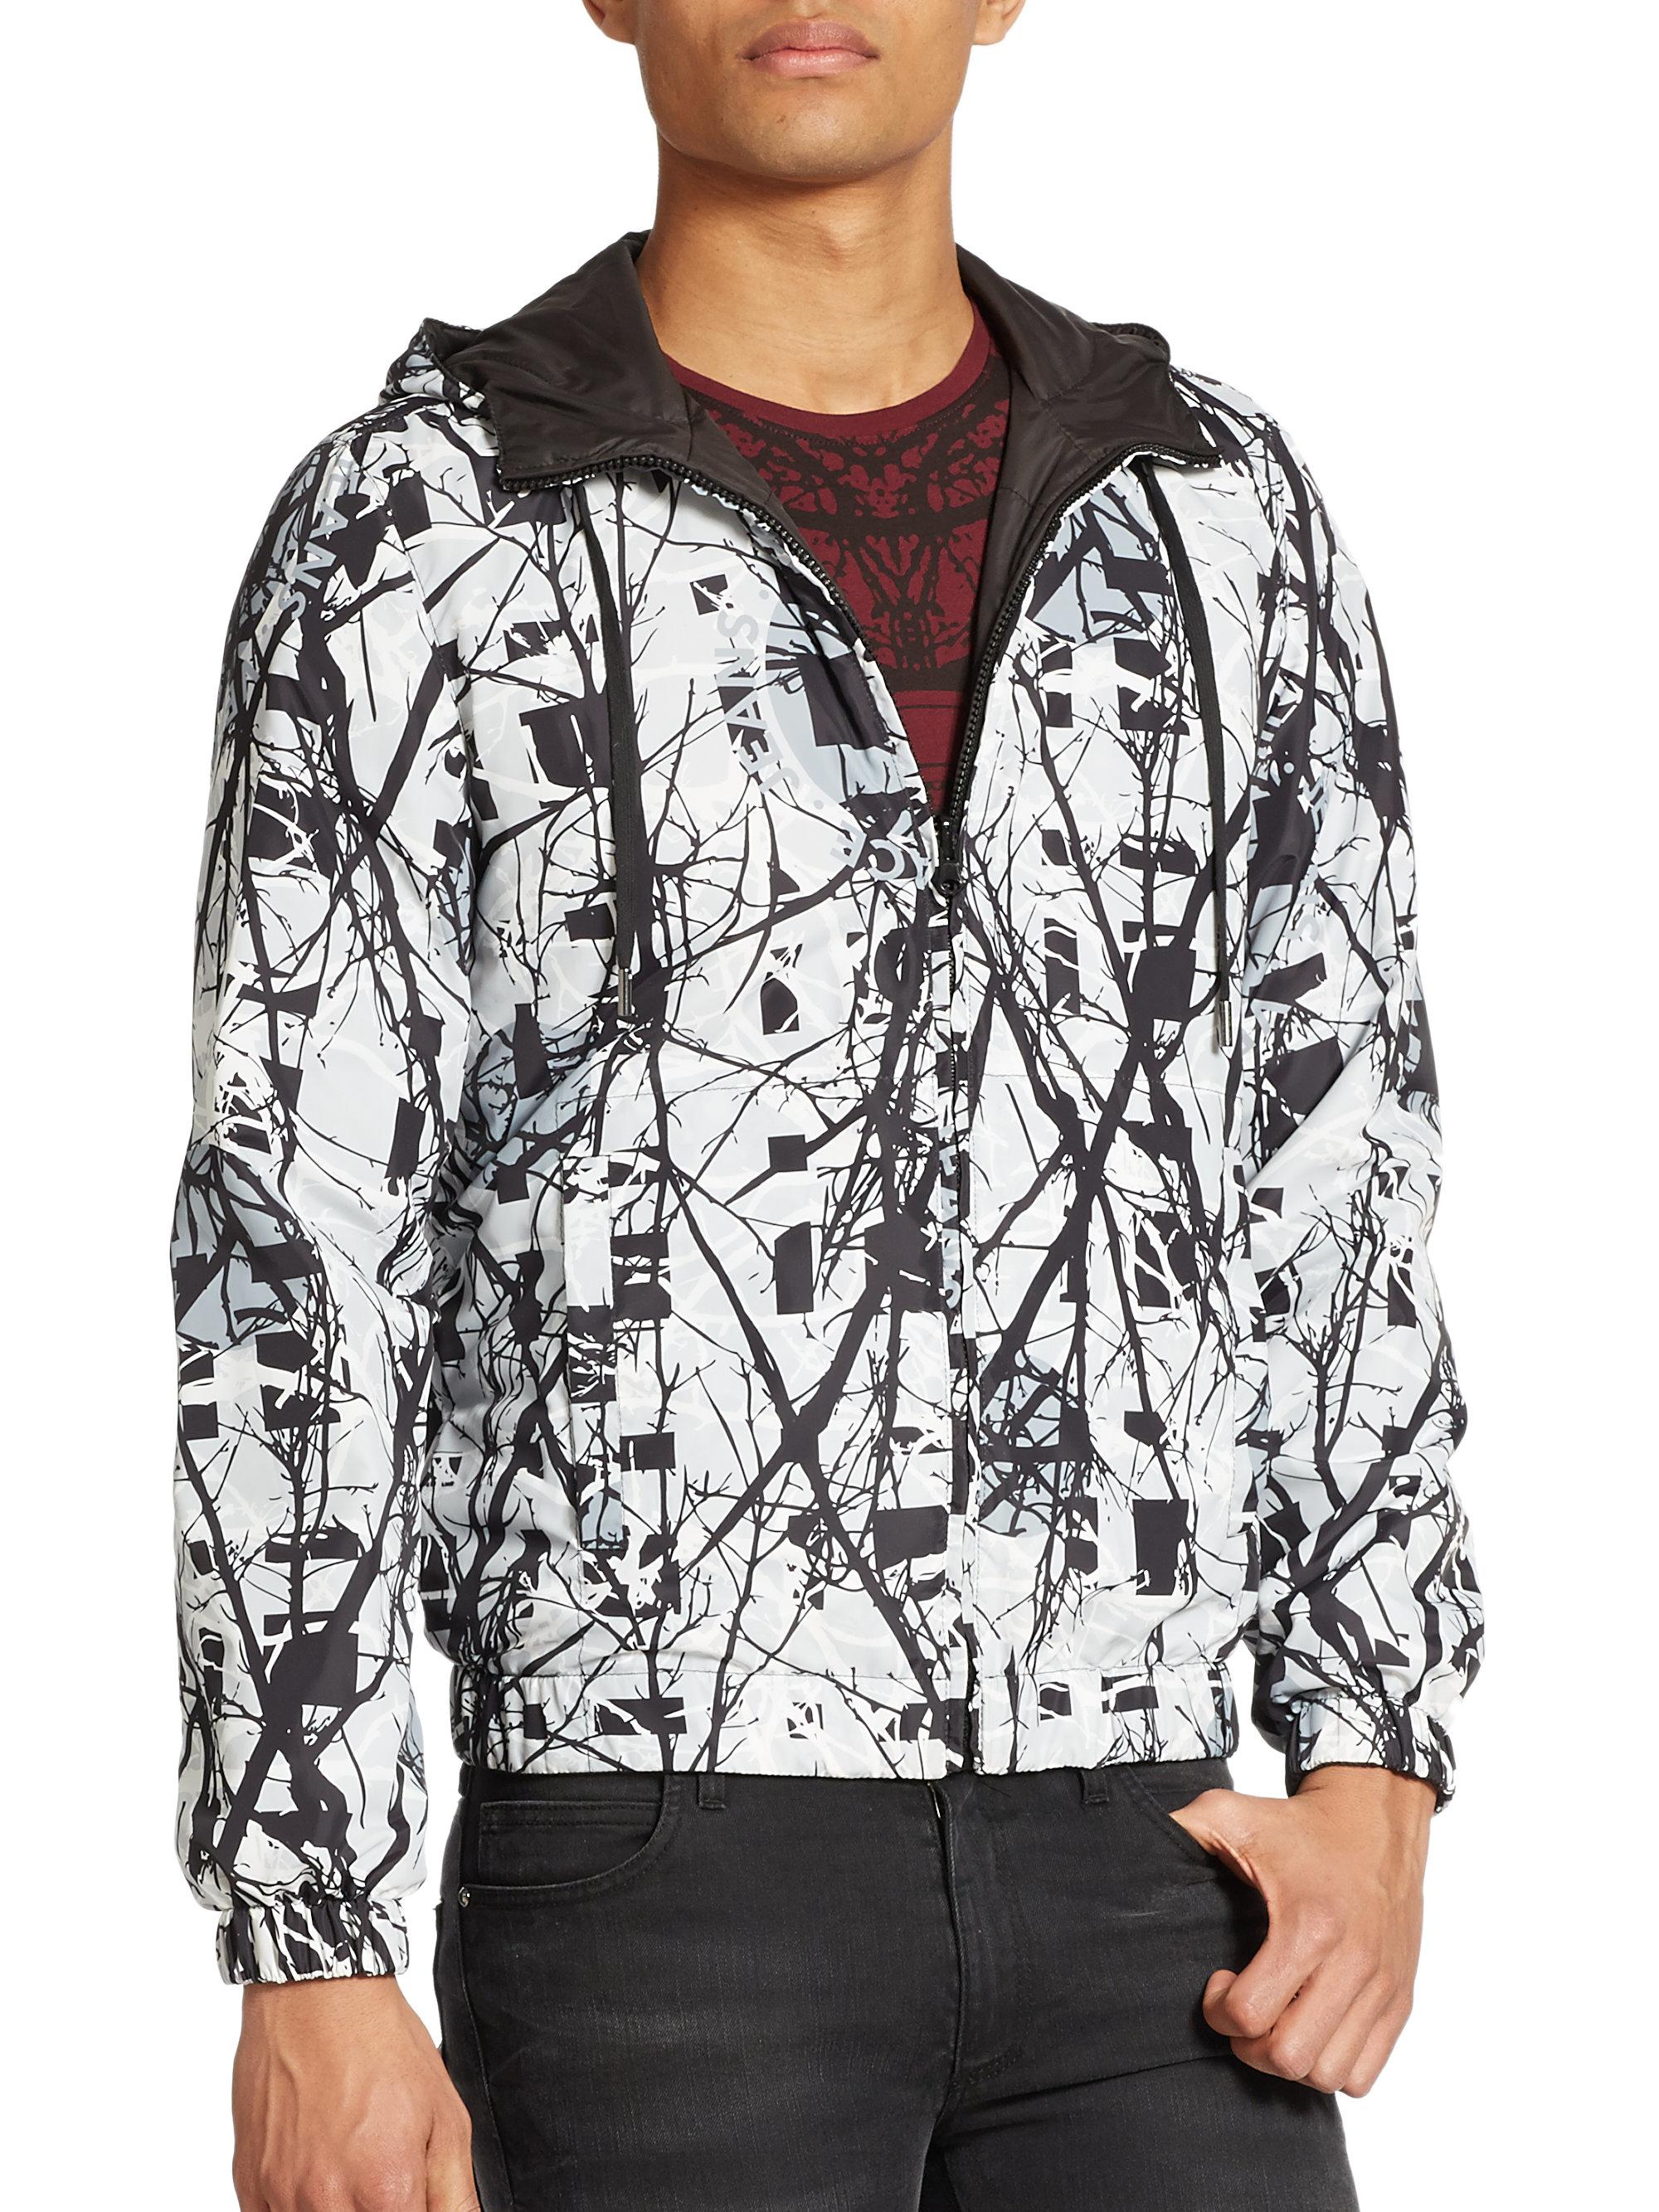 967ca9bb92 Versace Jeans Reversible Print Jacket in Black for Men - Lyst